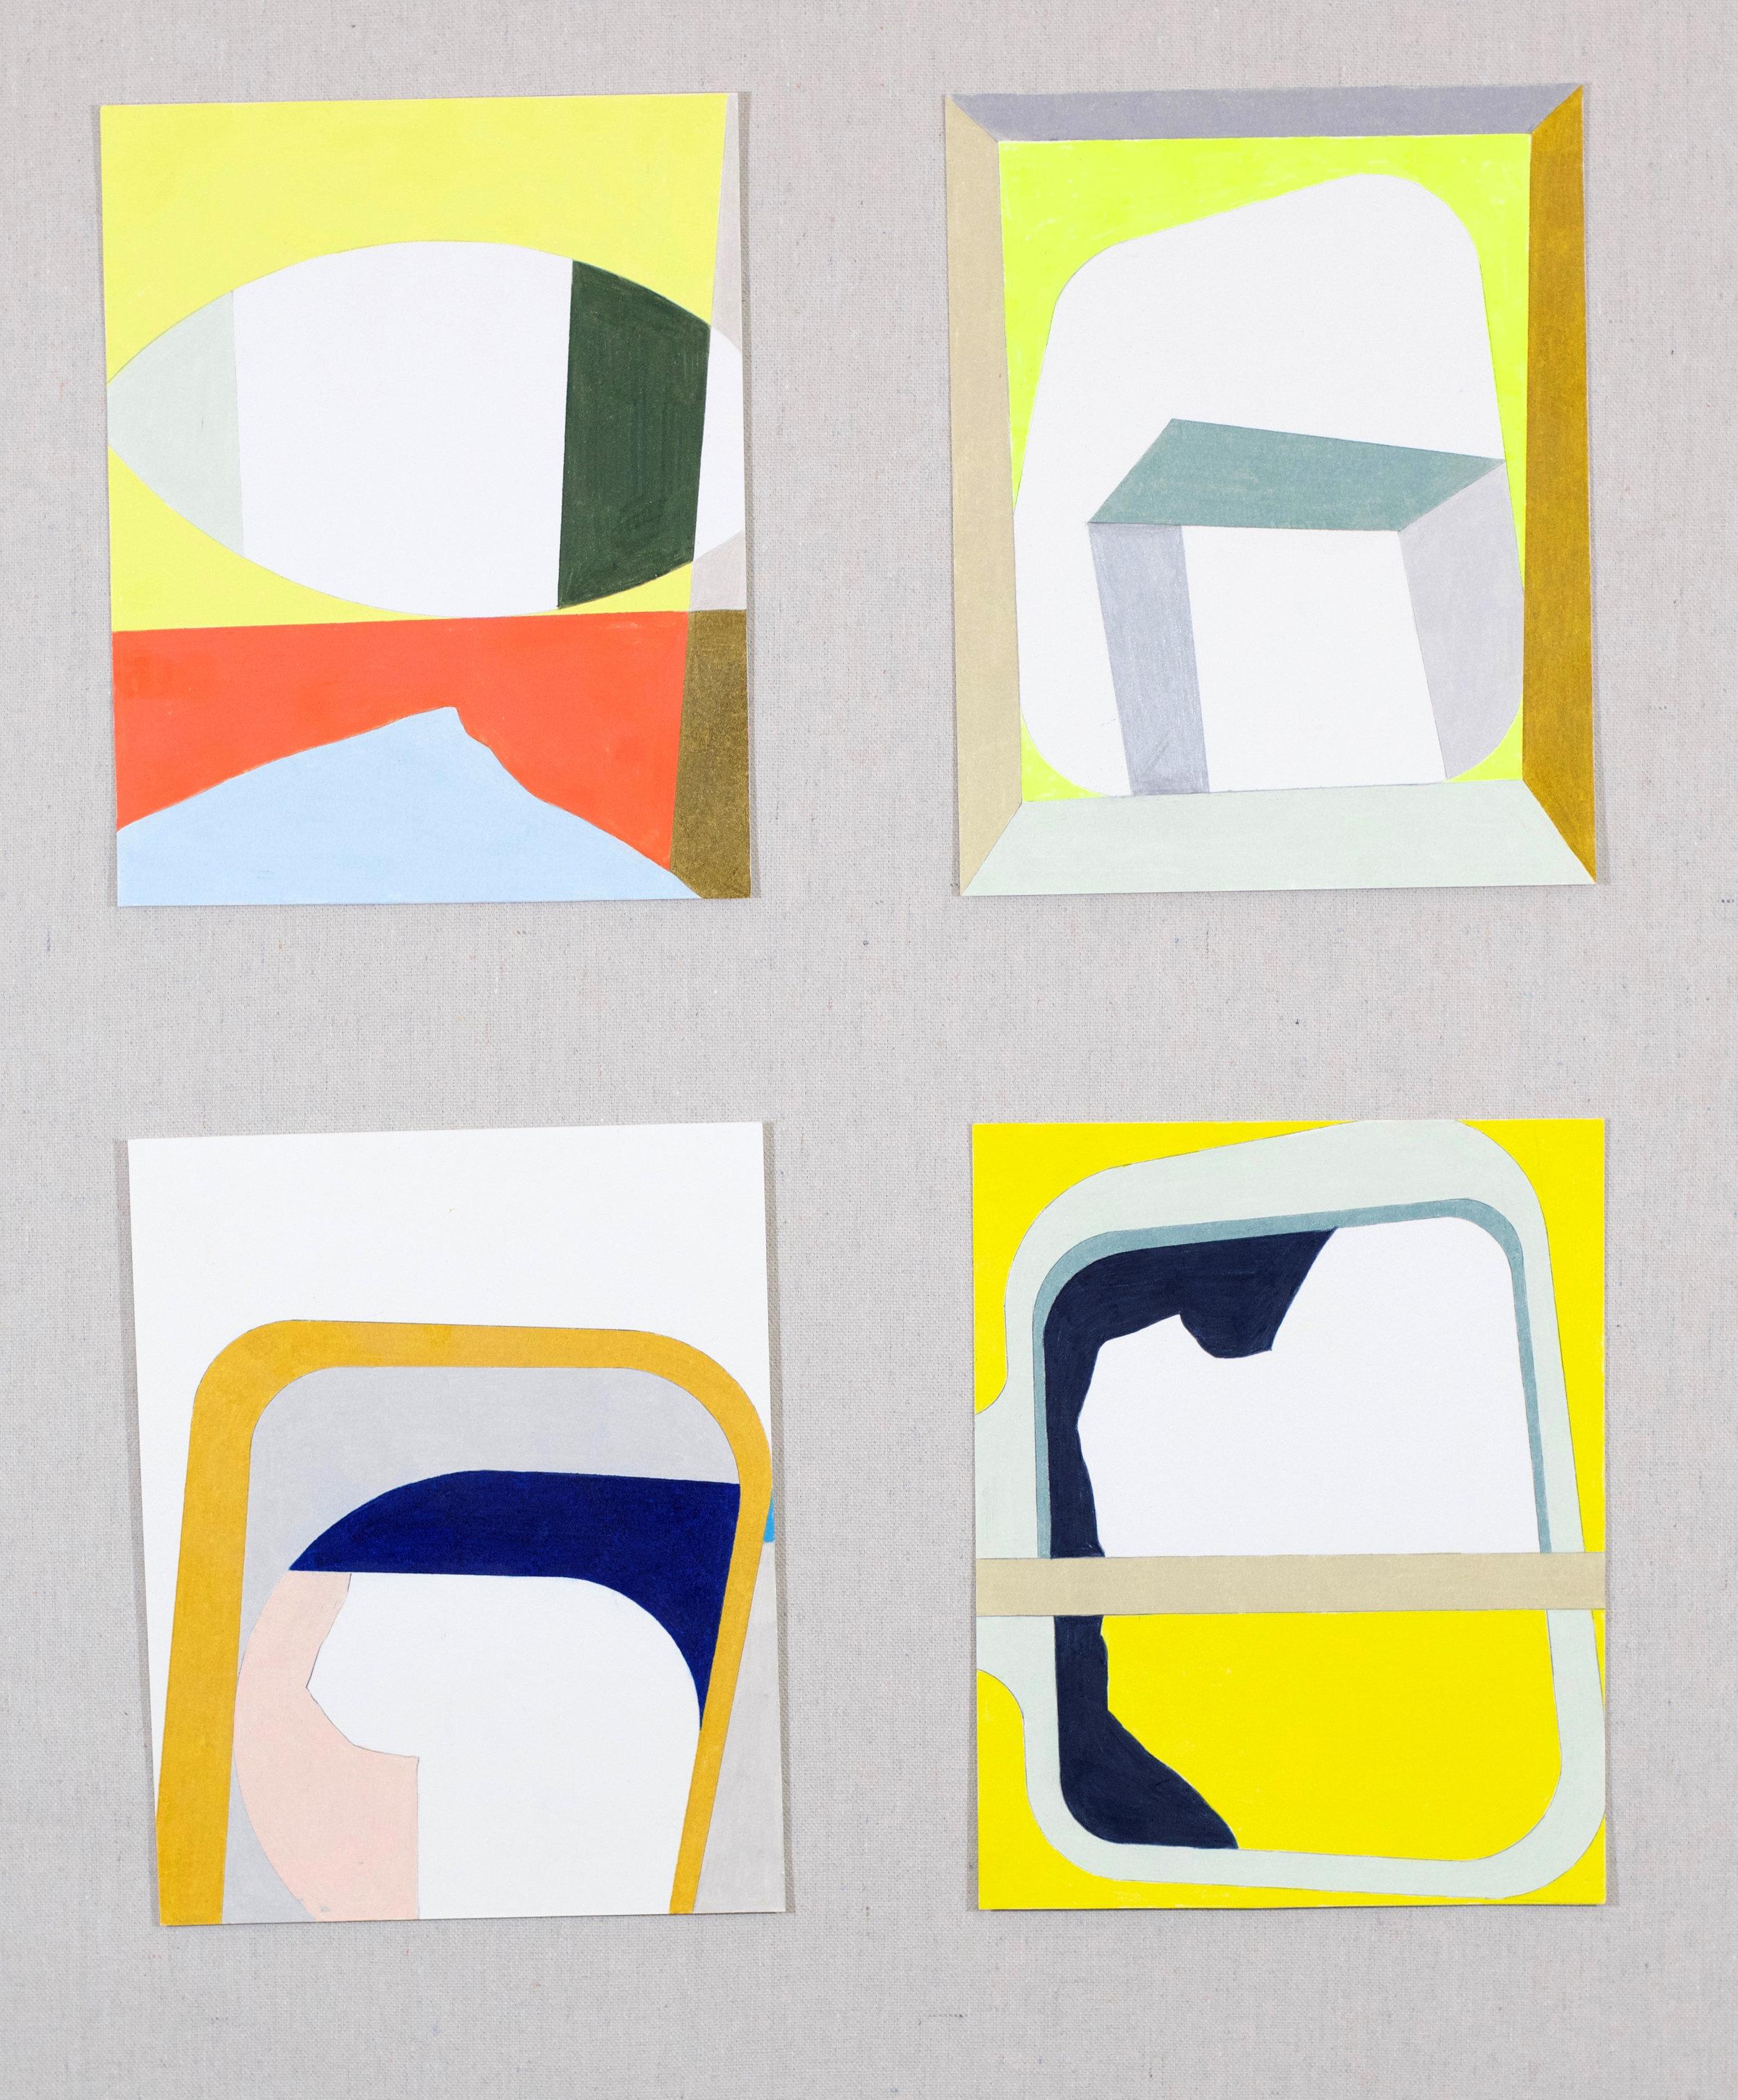 Untitled studies, 2017